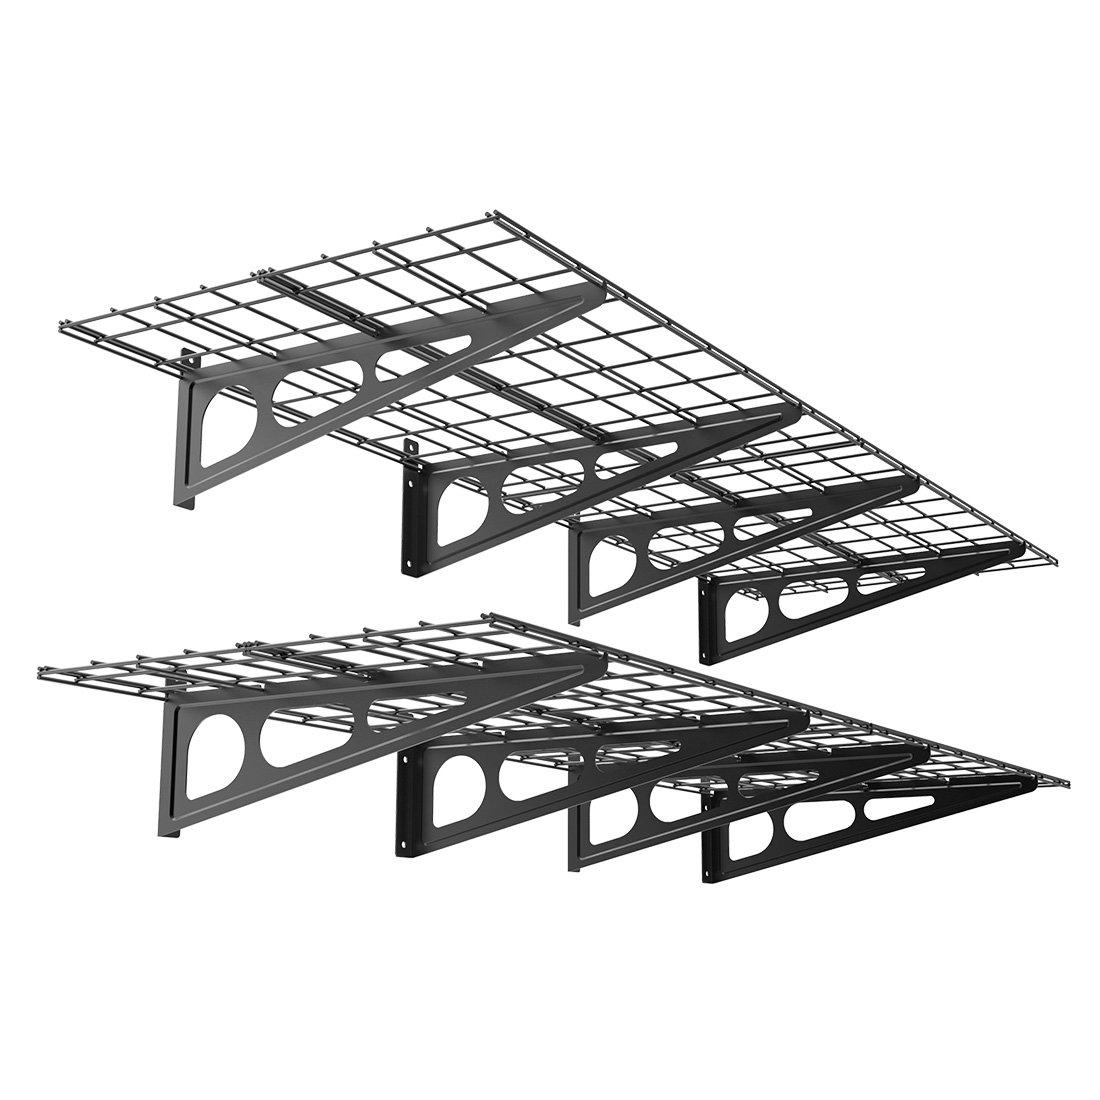 FLEXIMOUNTS WR26B-SBA 2' x 6' Wall Shelf Garage Storage Rack (2 Pack), Black, 24'' x 72''